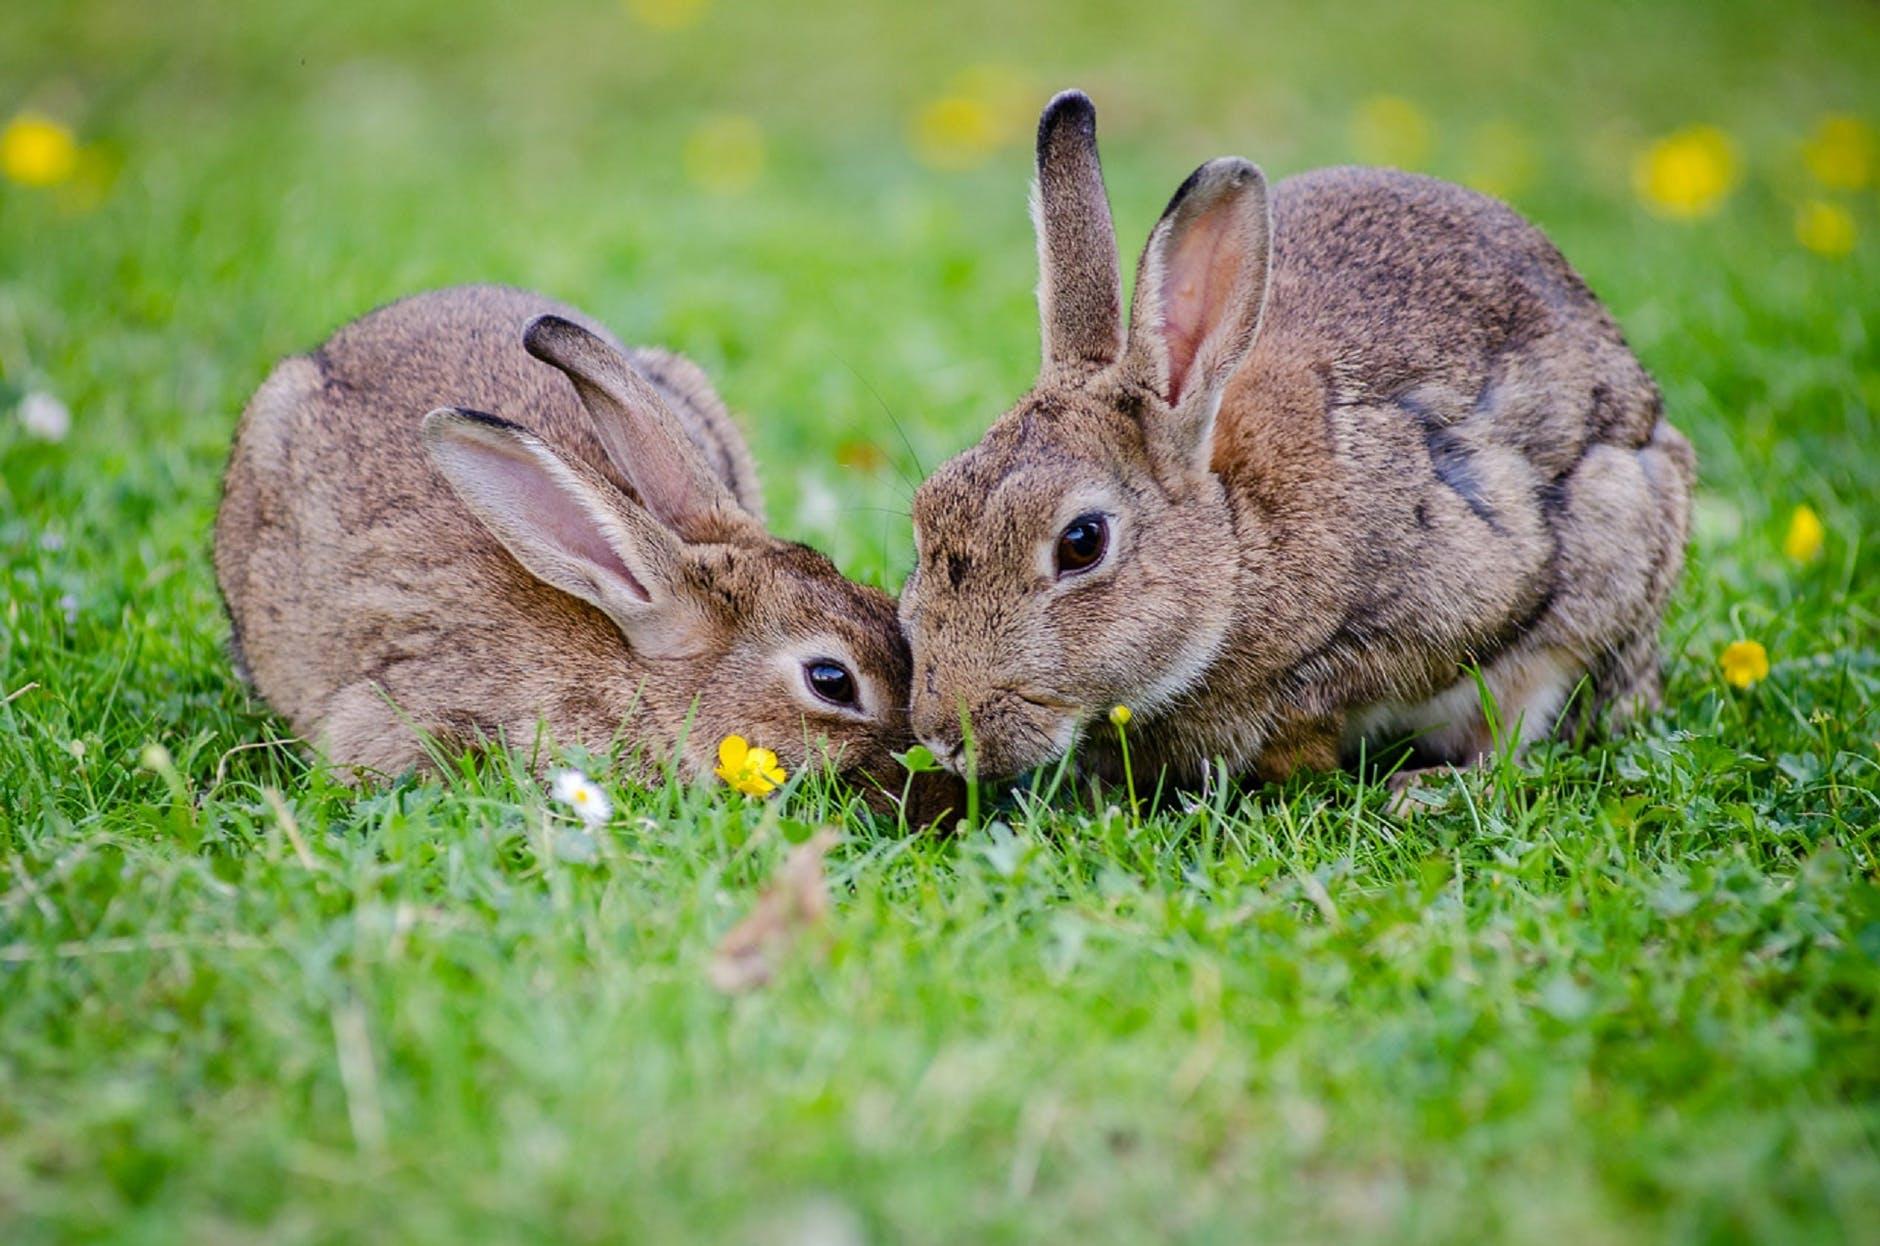 european-rabbits-bunnies-grass-wildlife.jpg